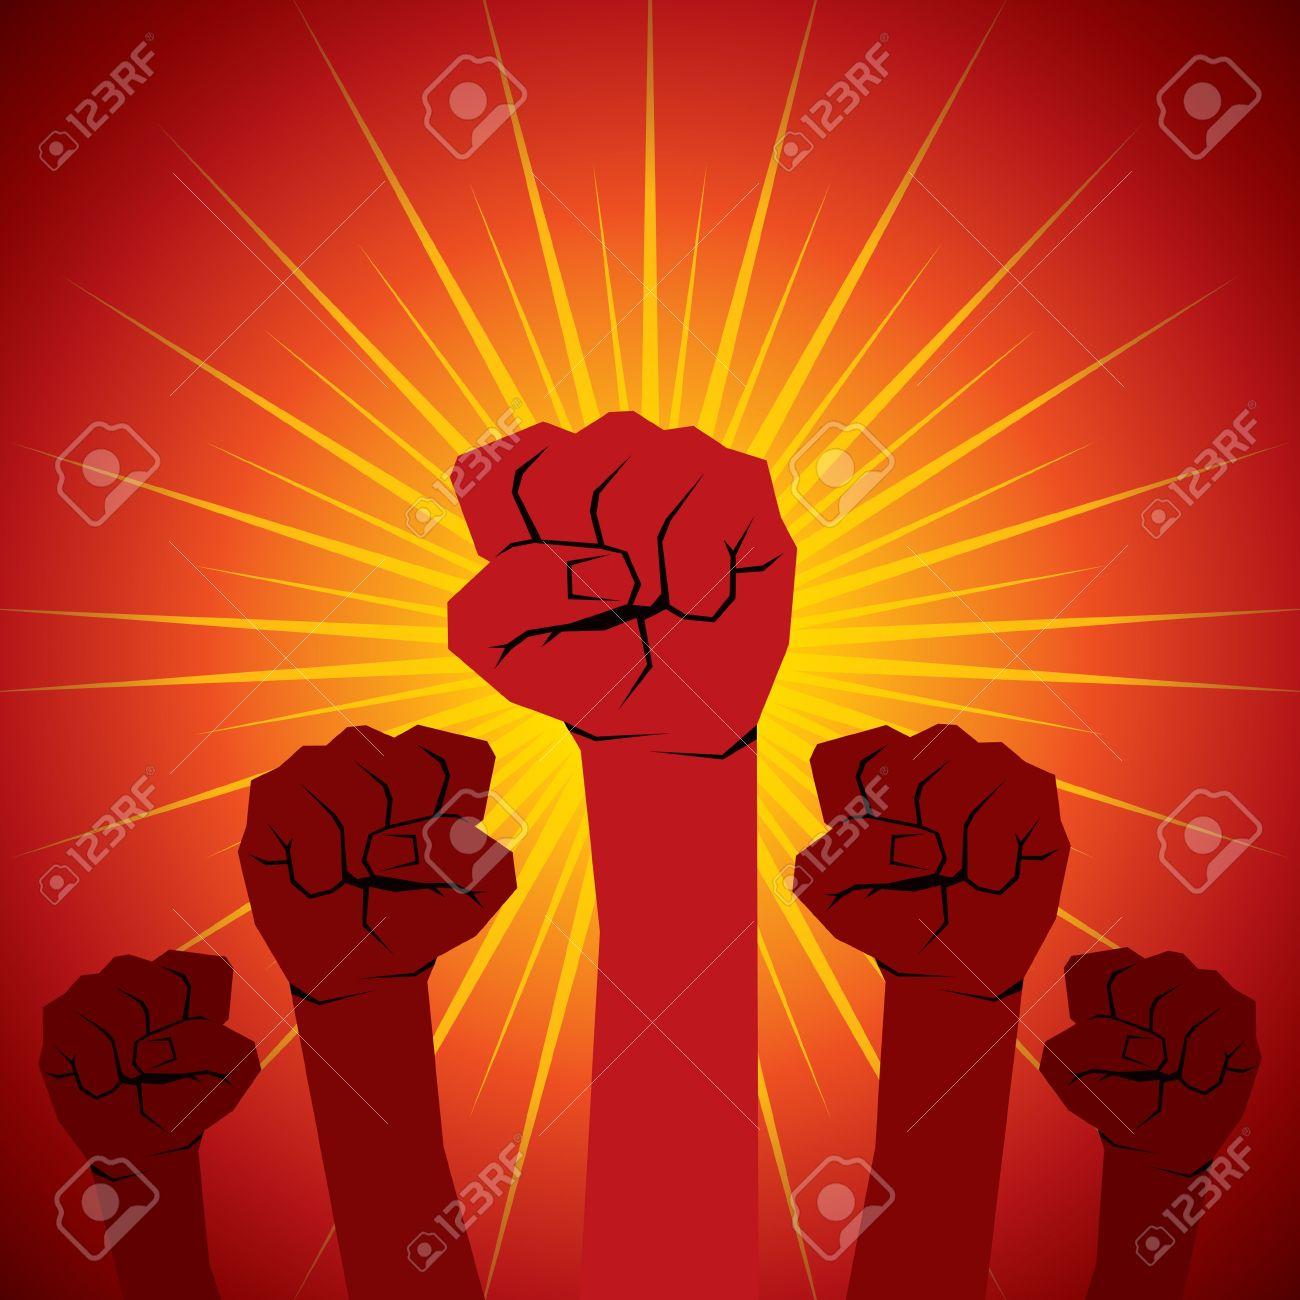 hand show the unity hand power stock vector Stock Vector - 16845573